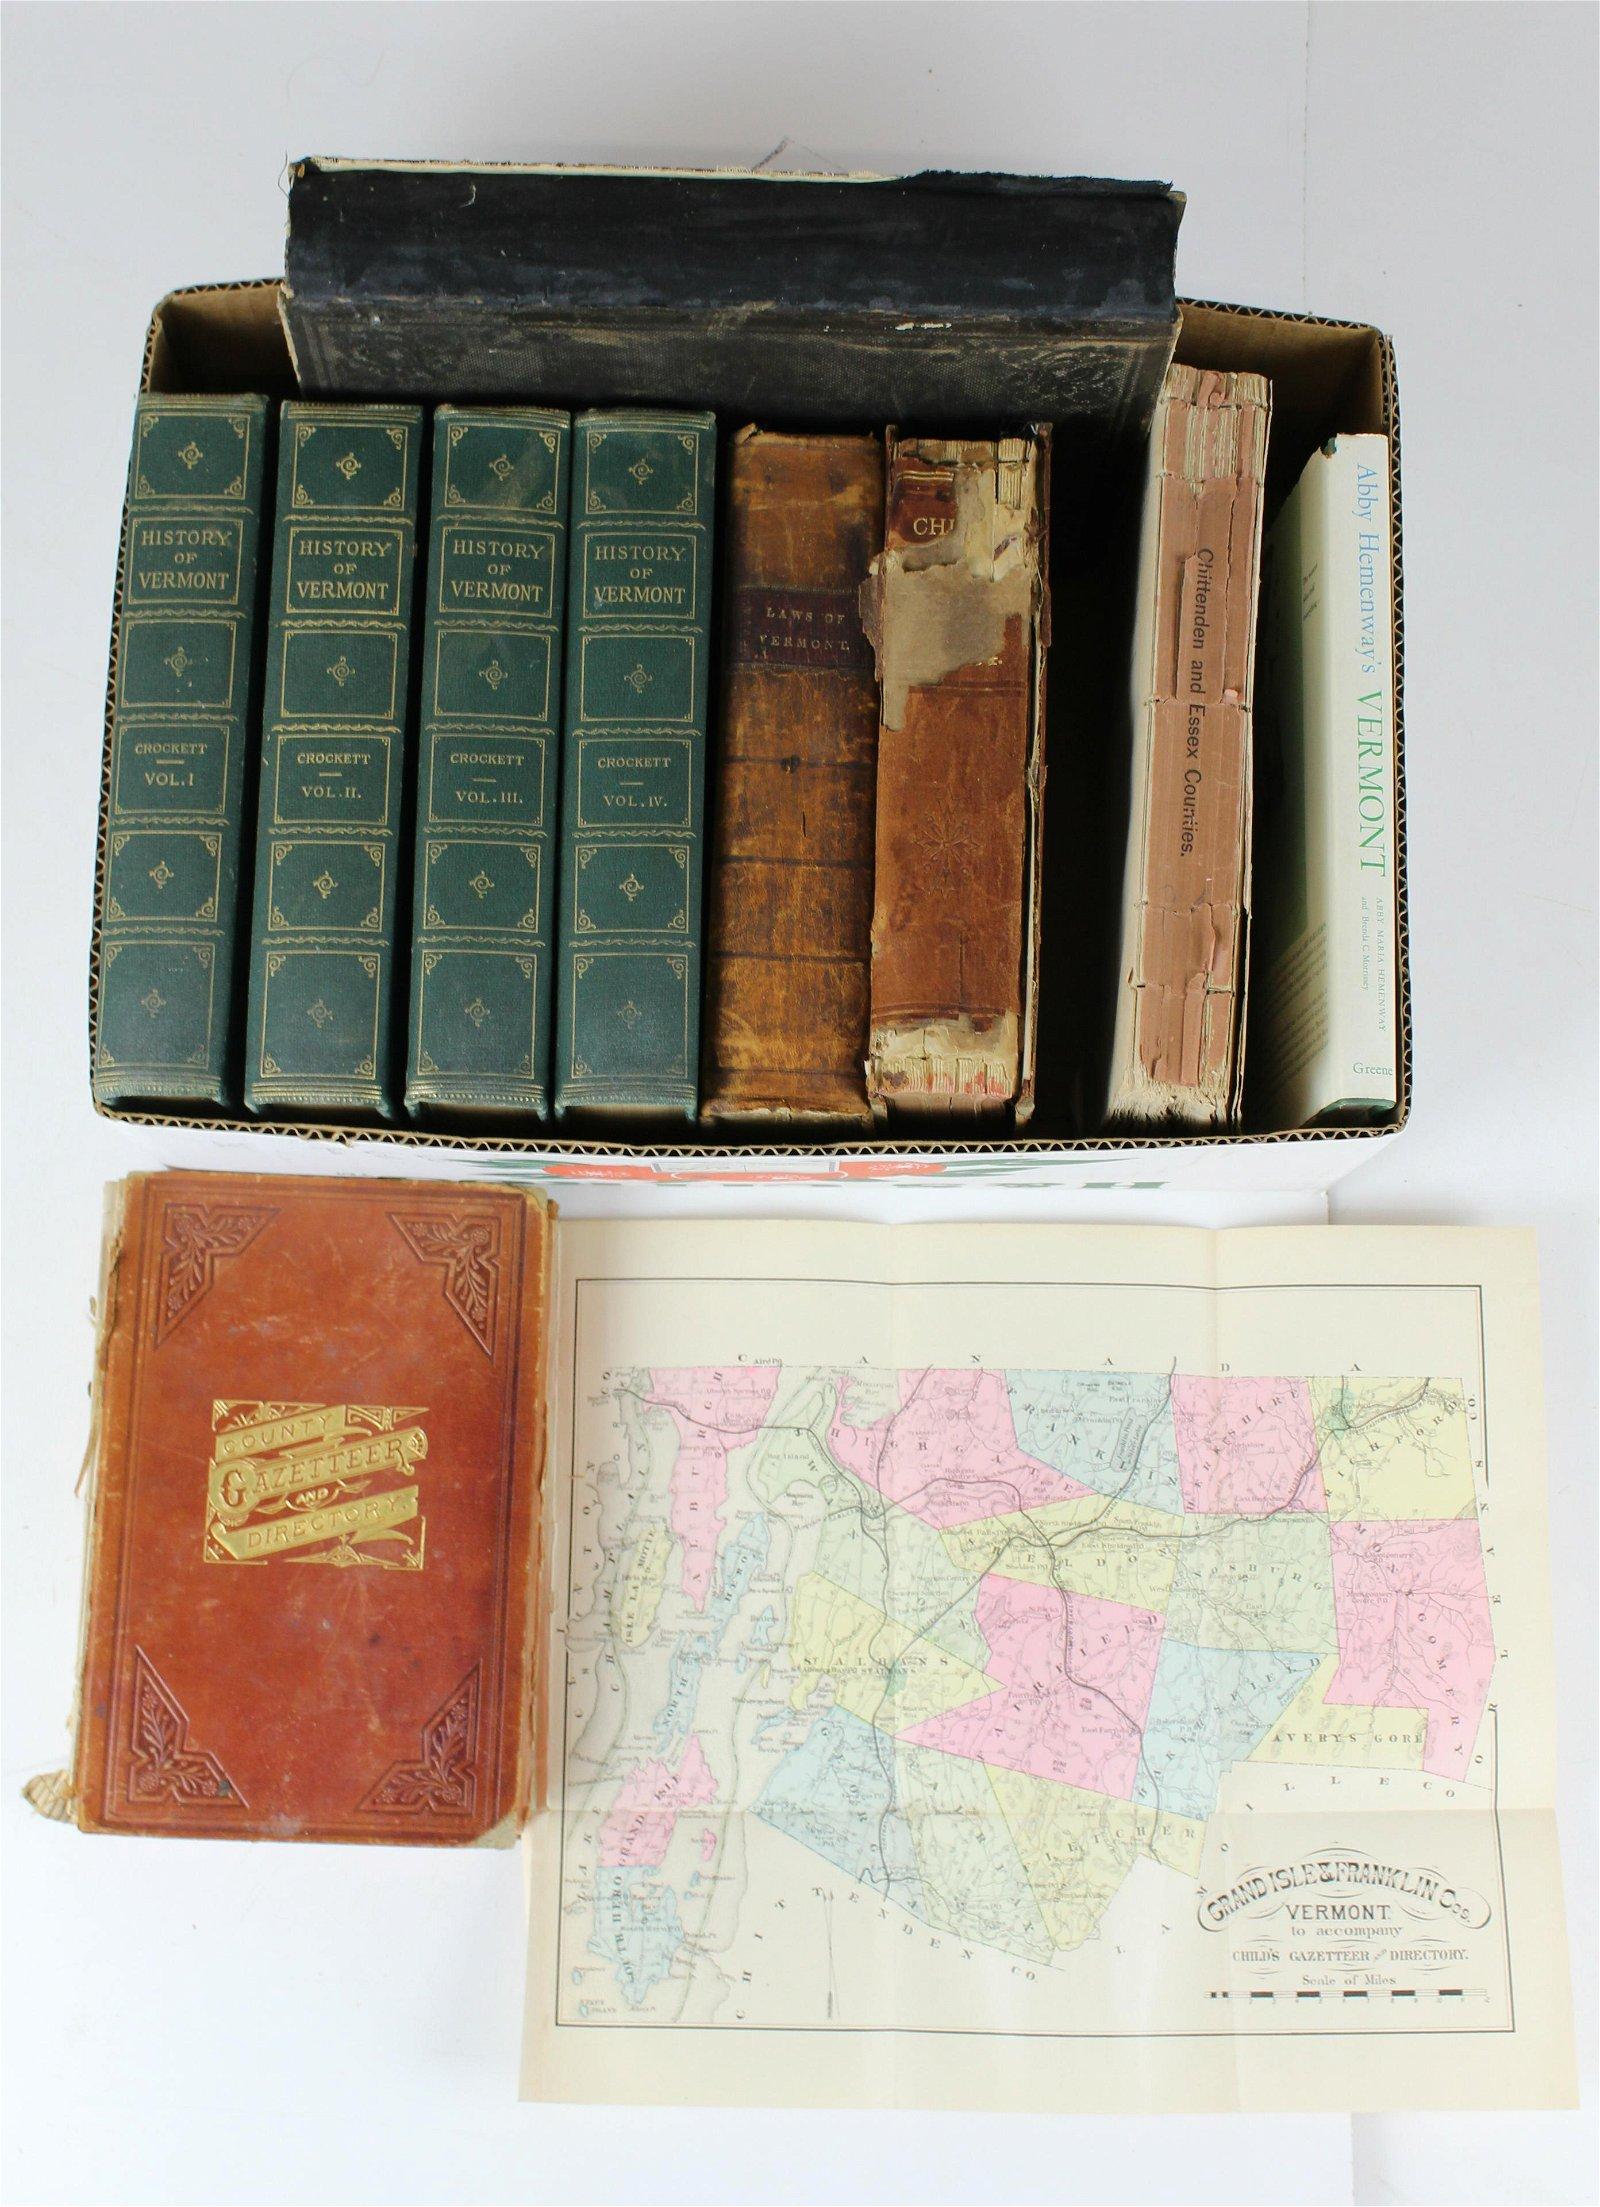 19th c VT books, gazetteers, imprints